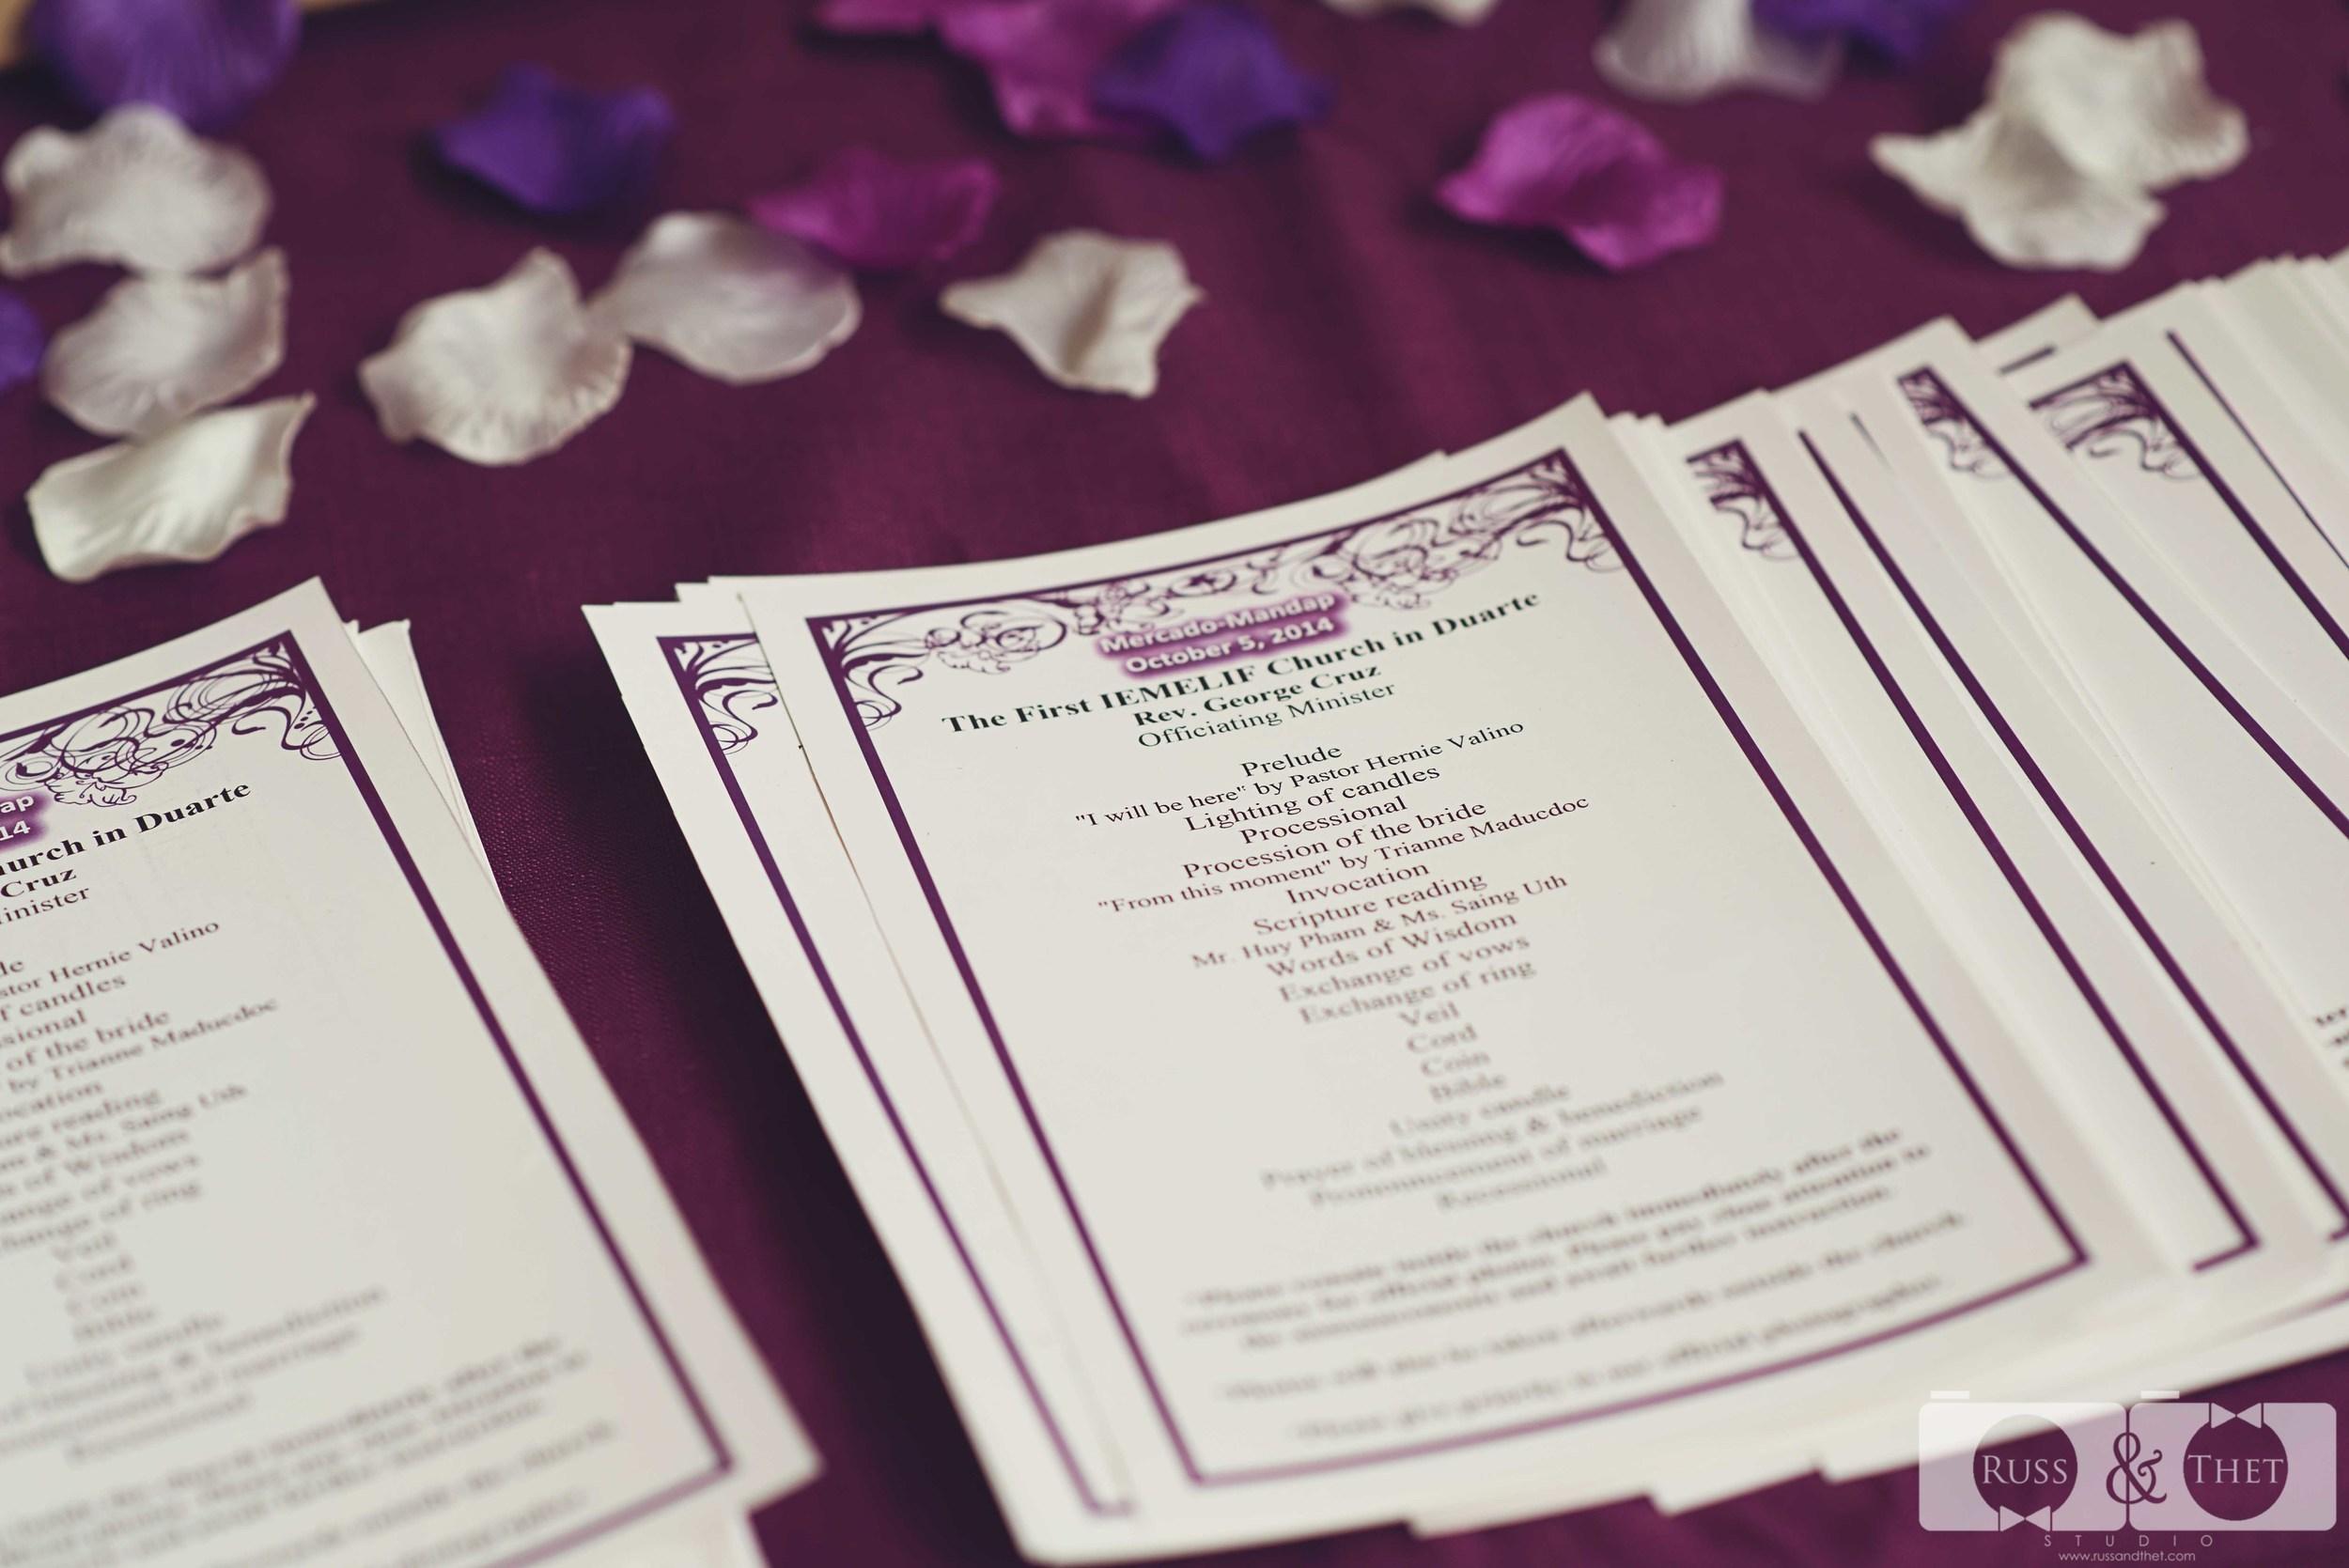 royal-palace-banquet-hall-glendale-wedding-8.JPG